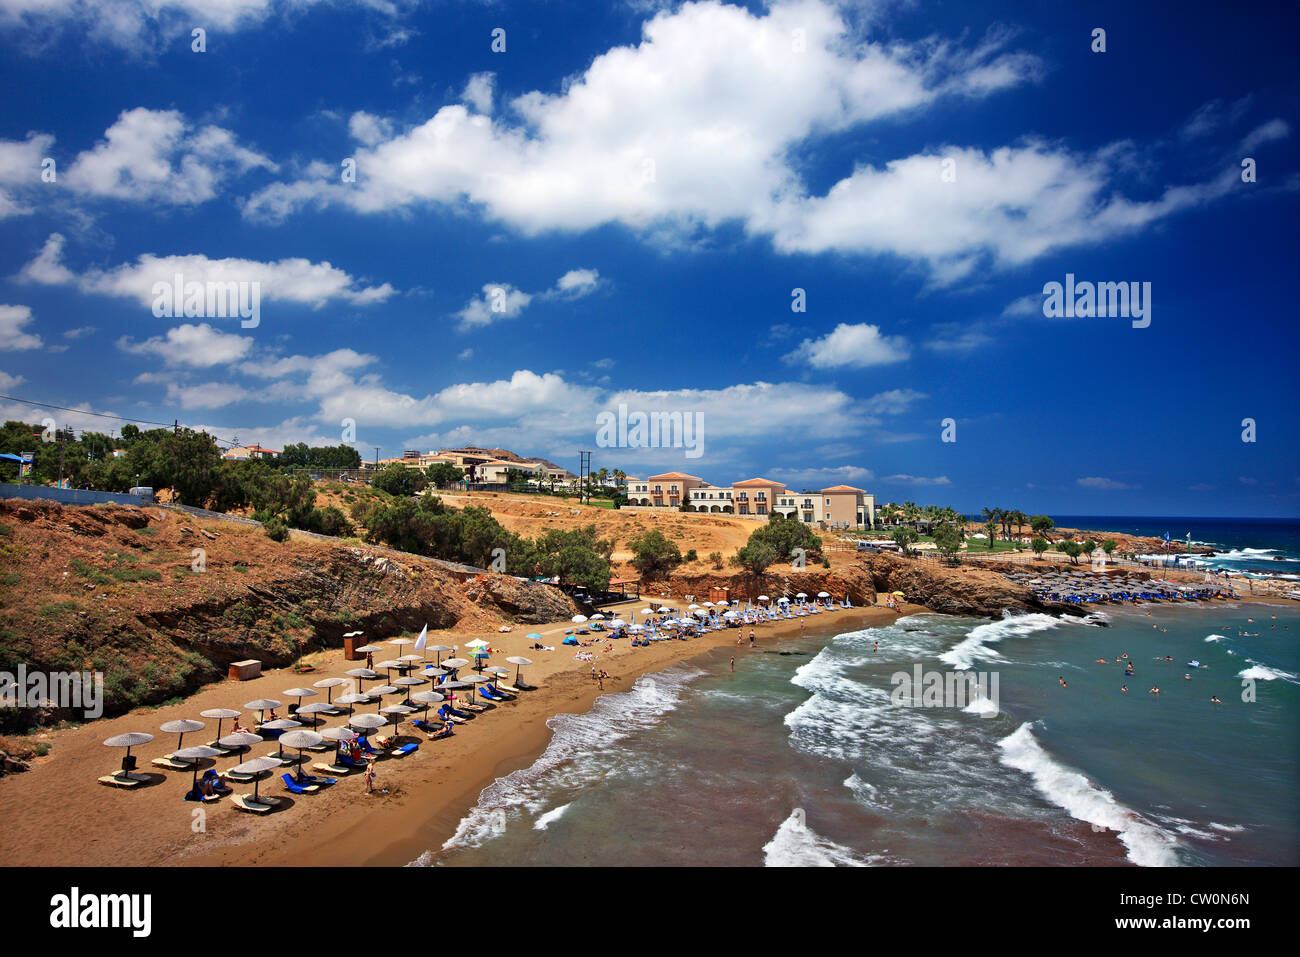 Pamormos village, popular touristic resort, at Rethymnon prefecture, Crete, Greece - Stock Image